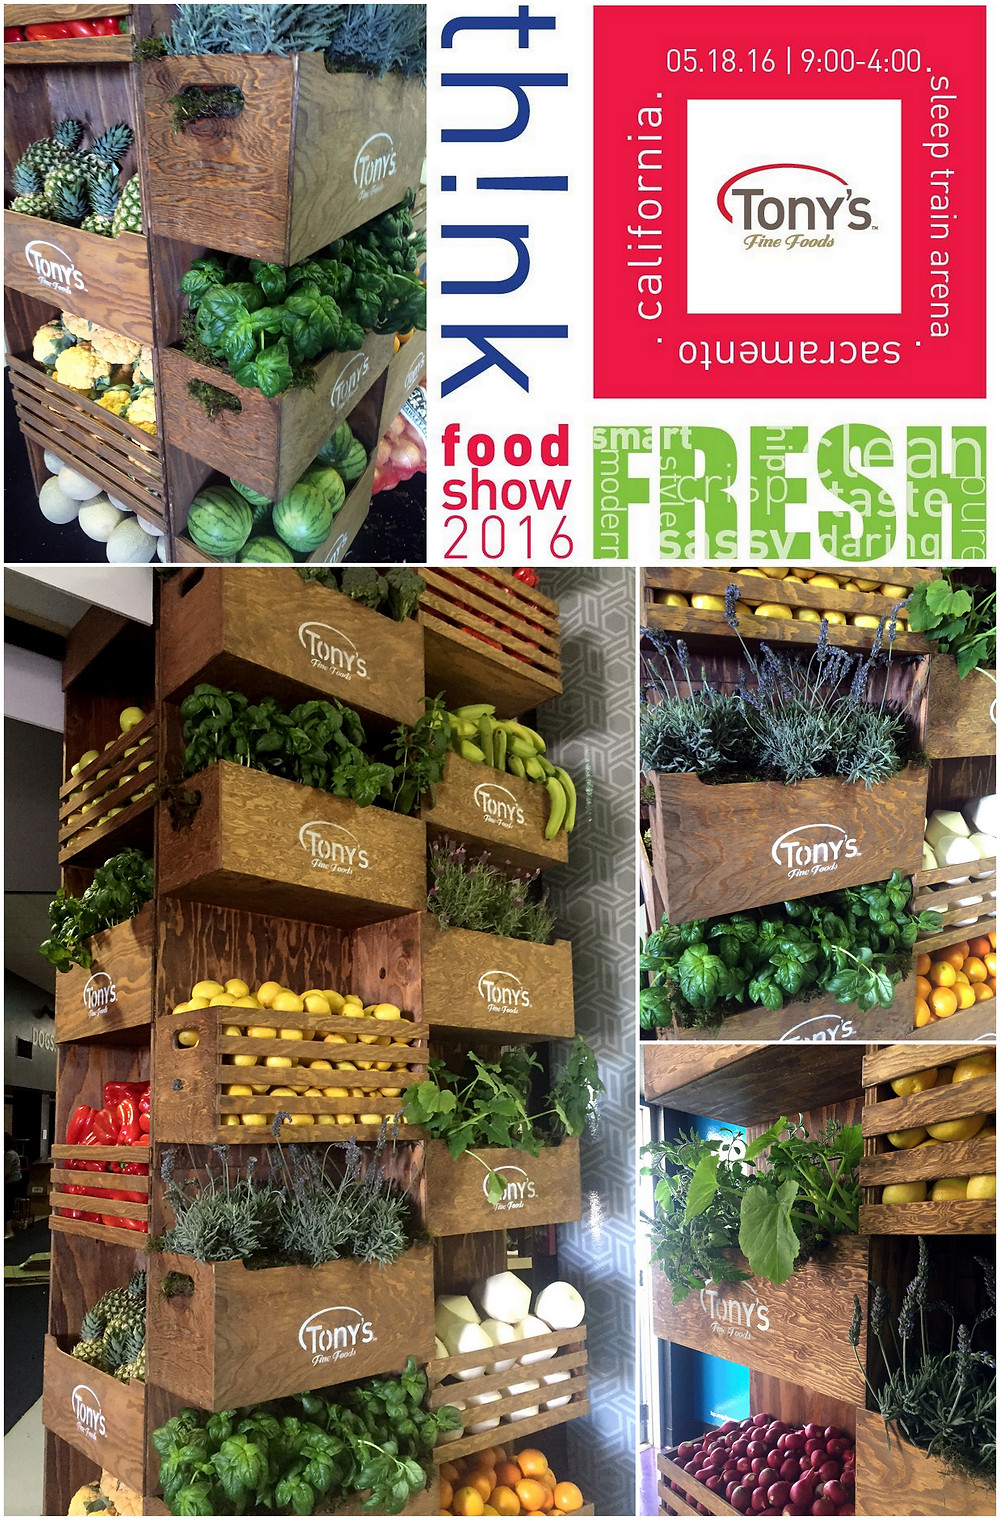 th!nk Fresh Food Show 2016